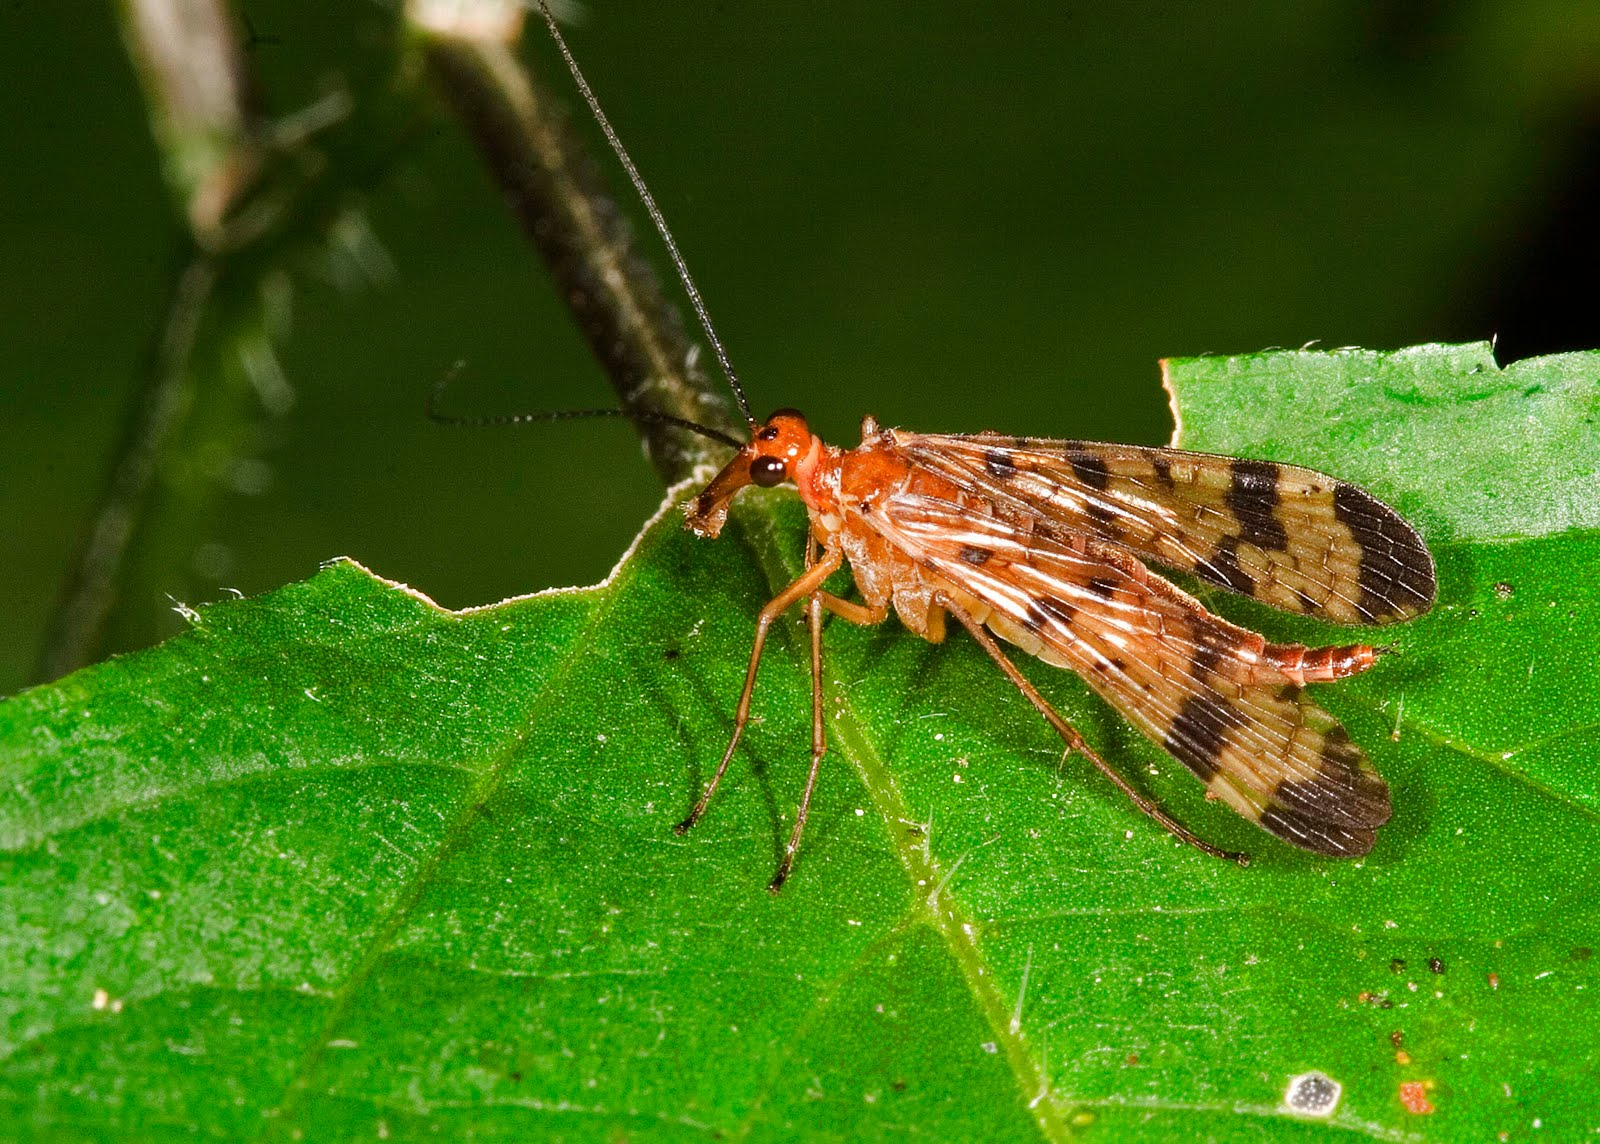 Illinois Natural History Survey: Insect Appreciation - photo#17